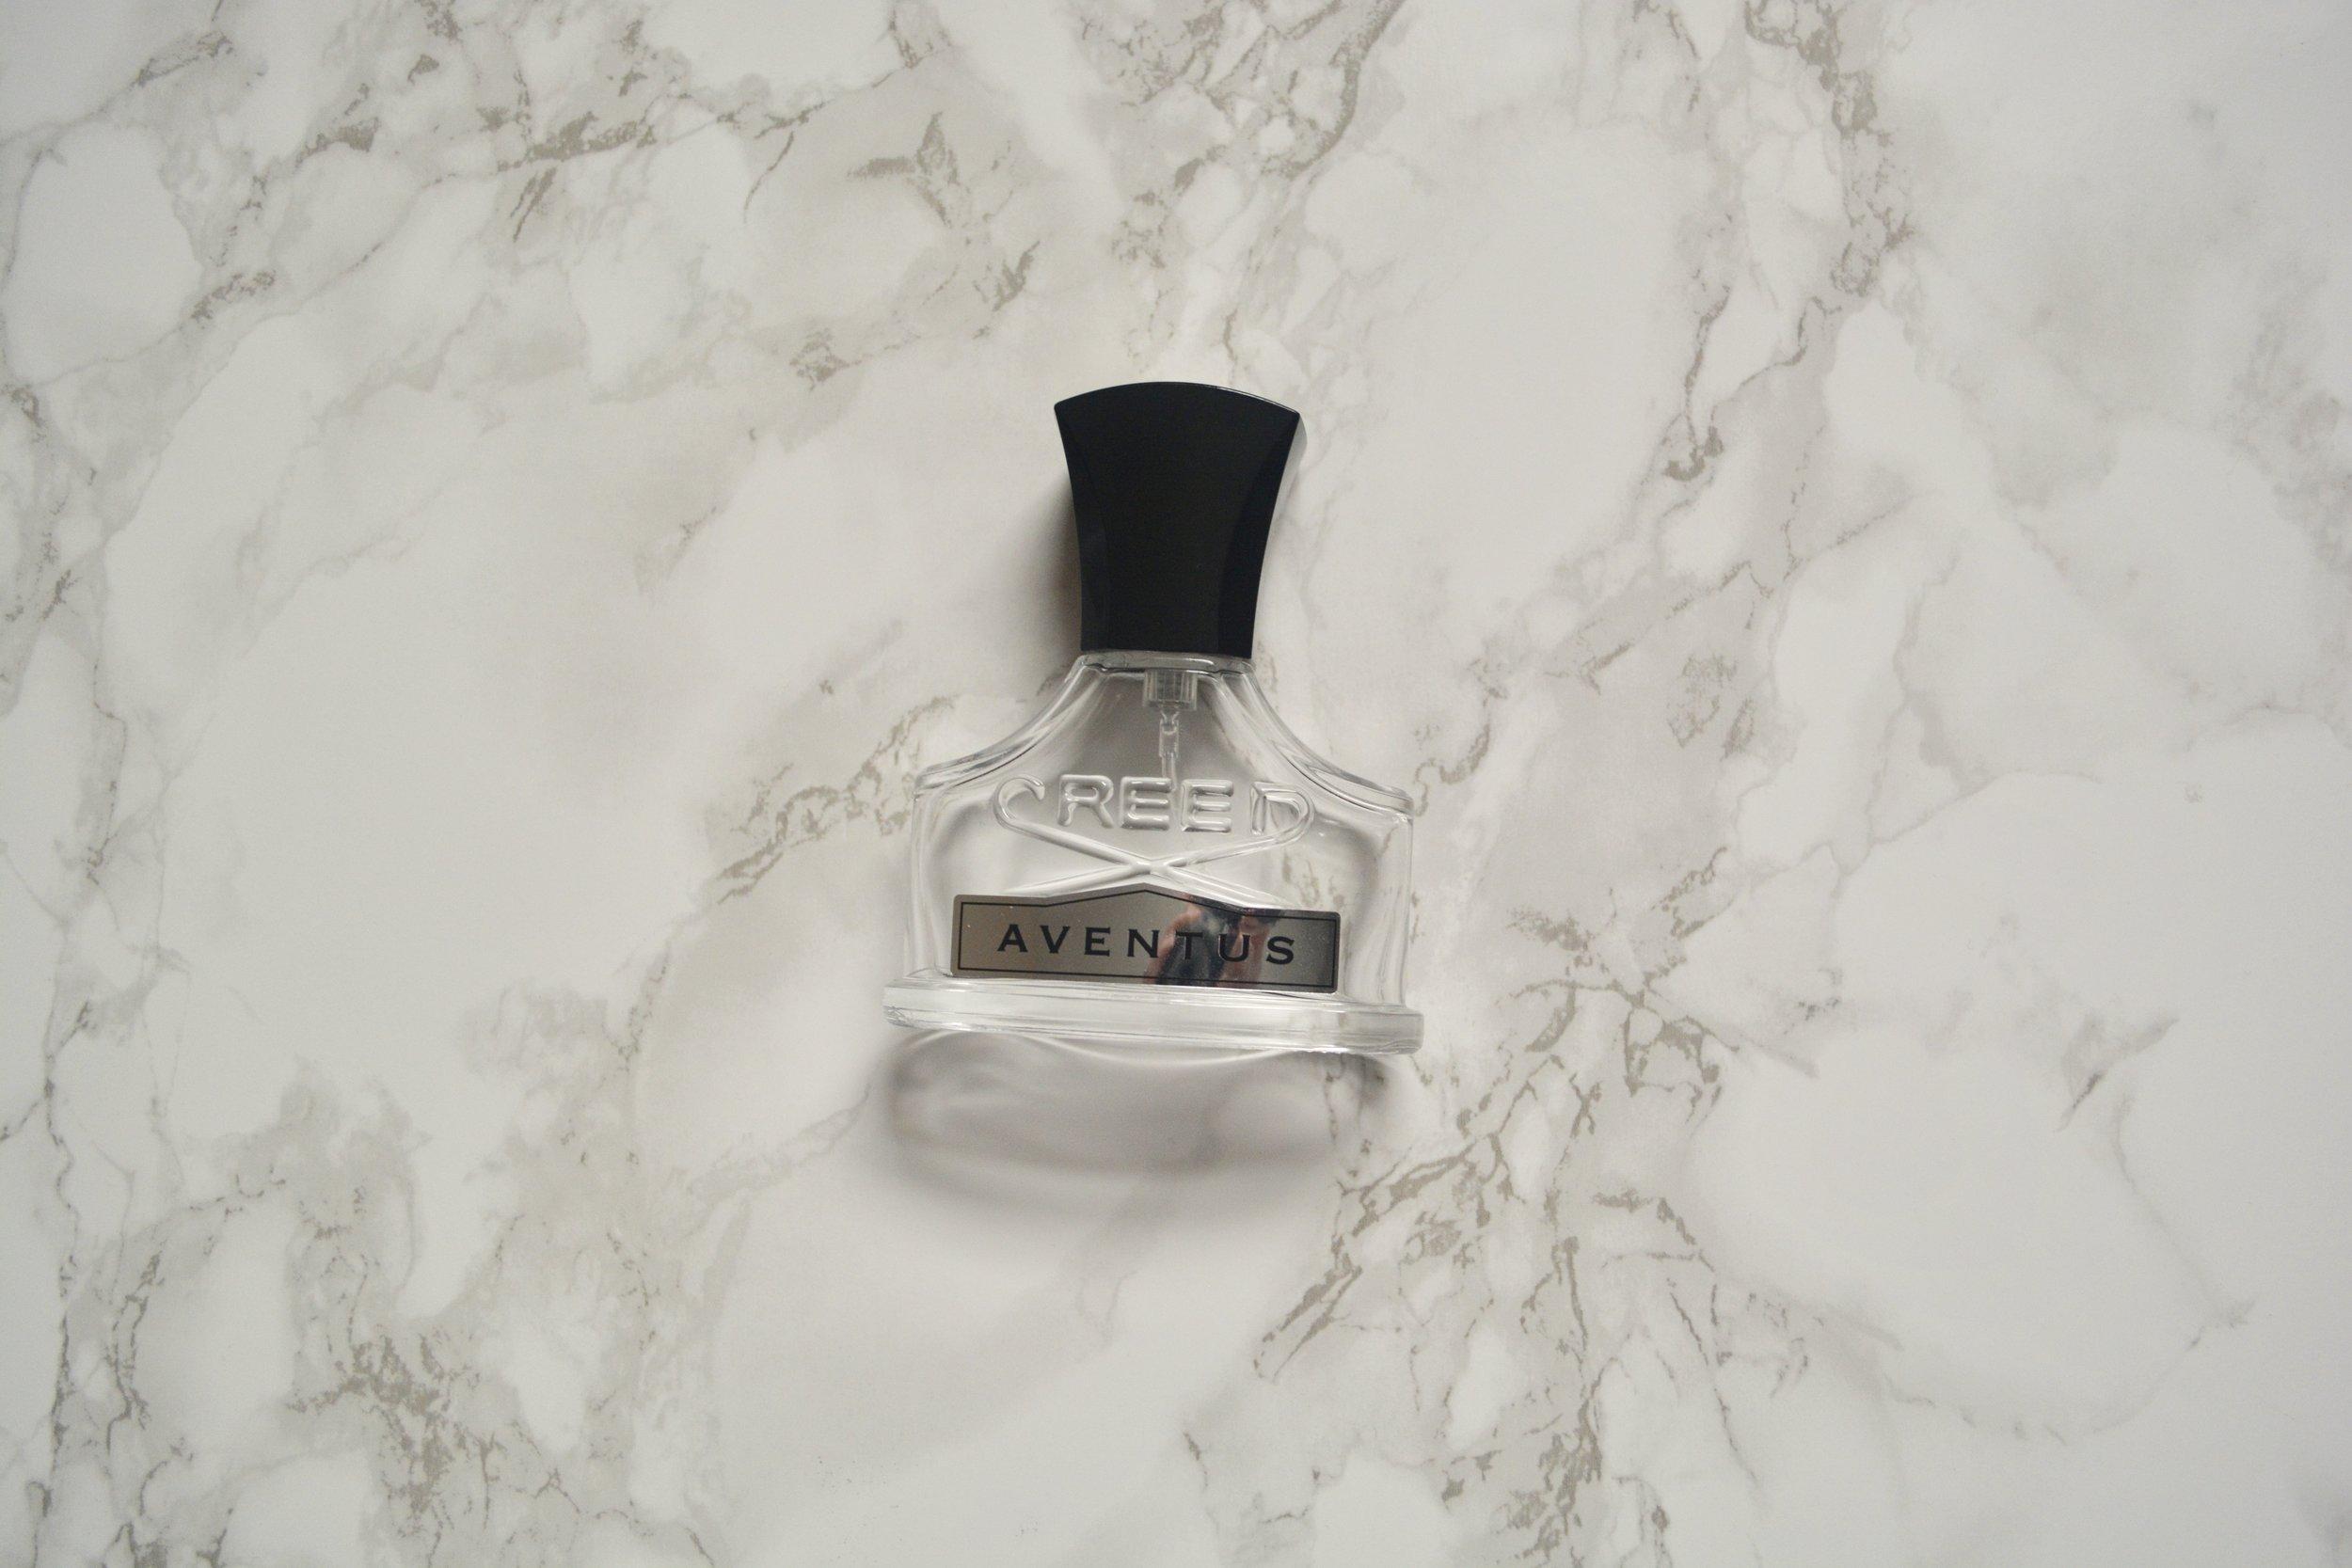 Creed Aventus Fragrance | Sam Squire UK male fashion & lifestyle blogger